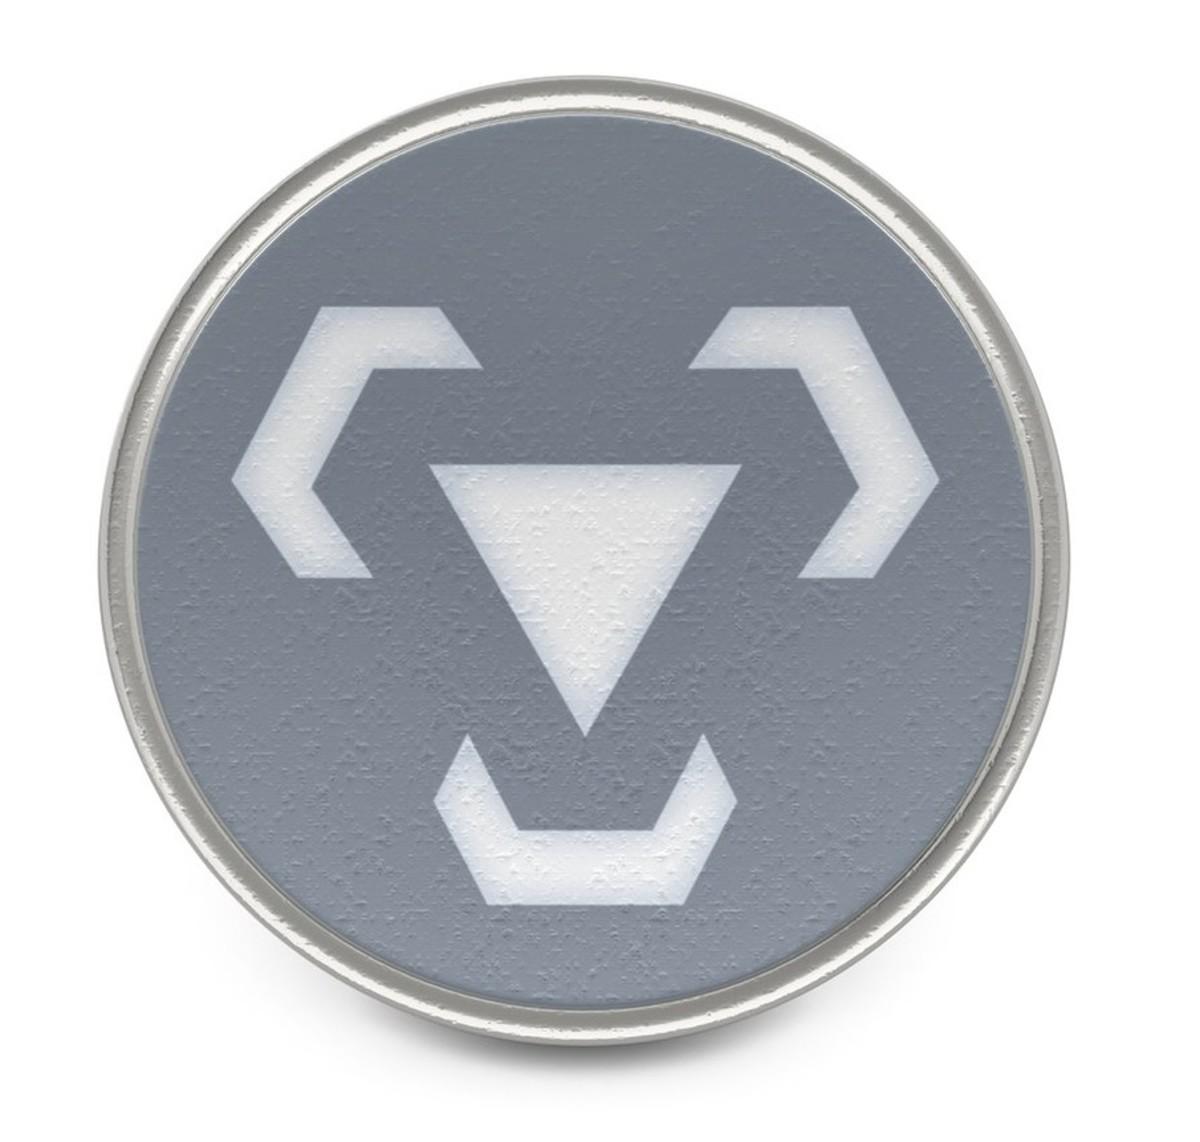 Steel Pokémon logo